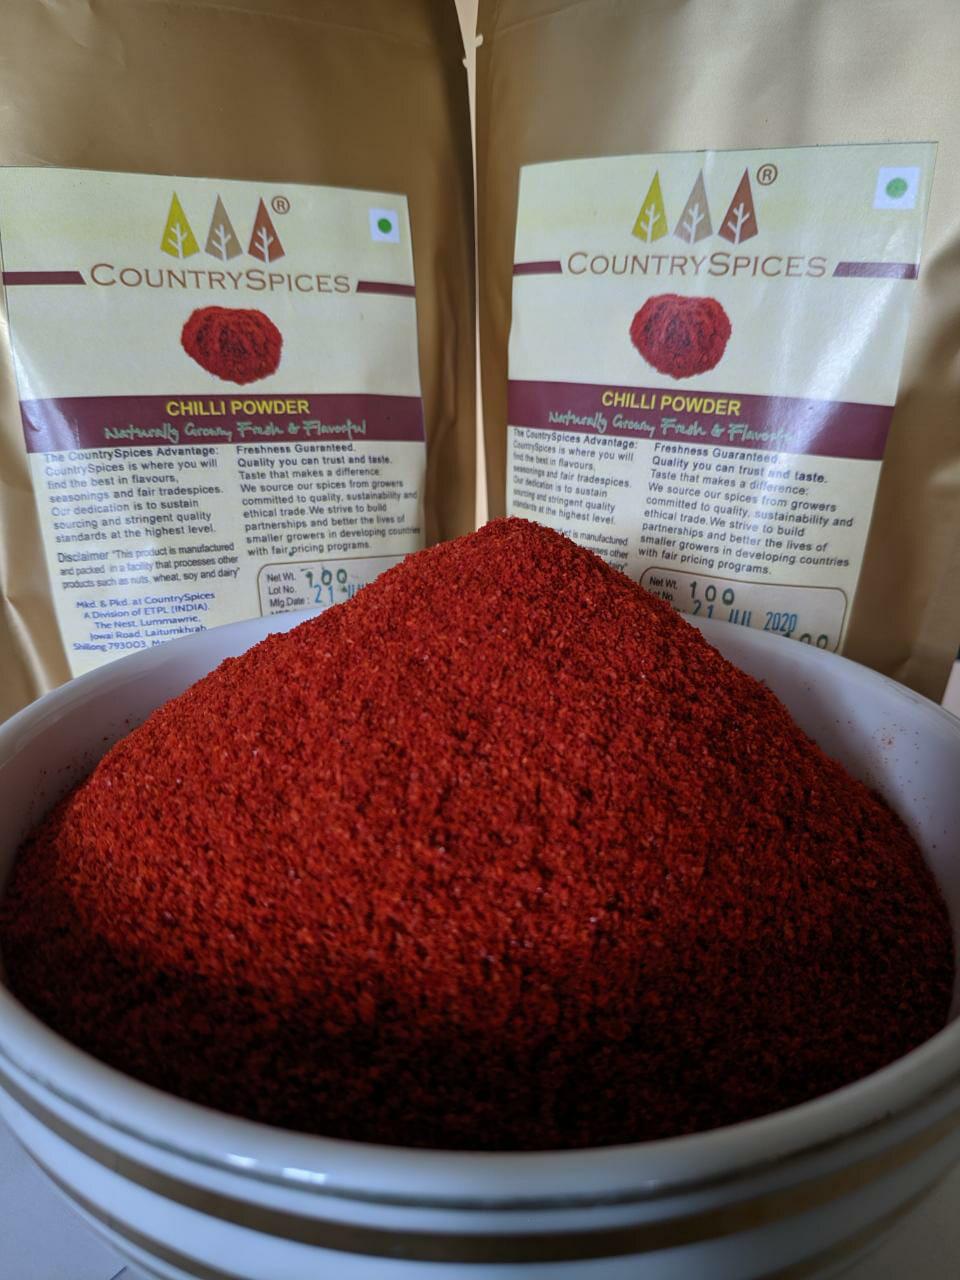 CountrySpices Red Chilli Powder